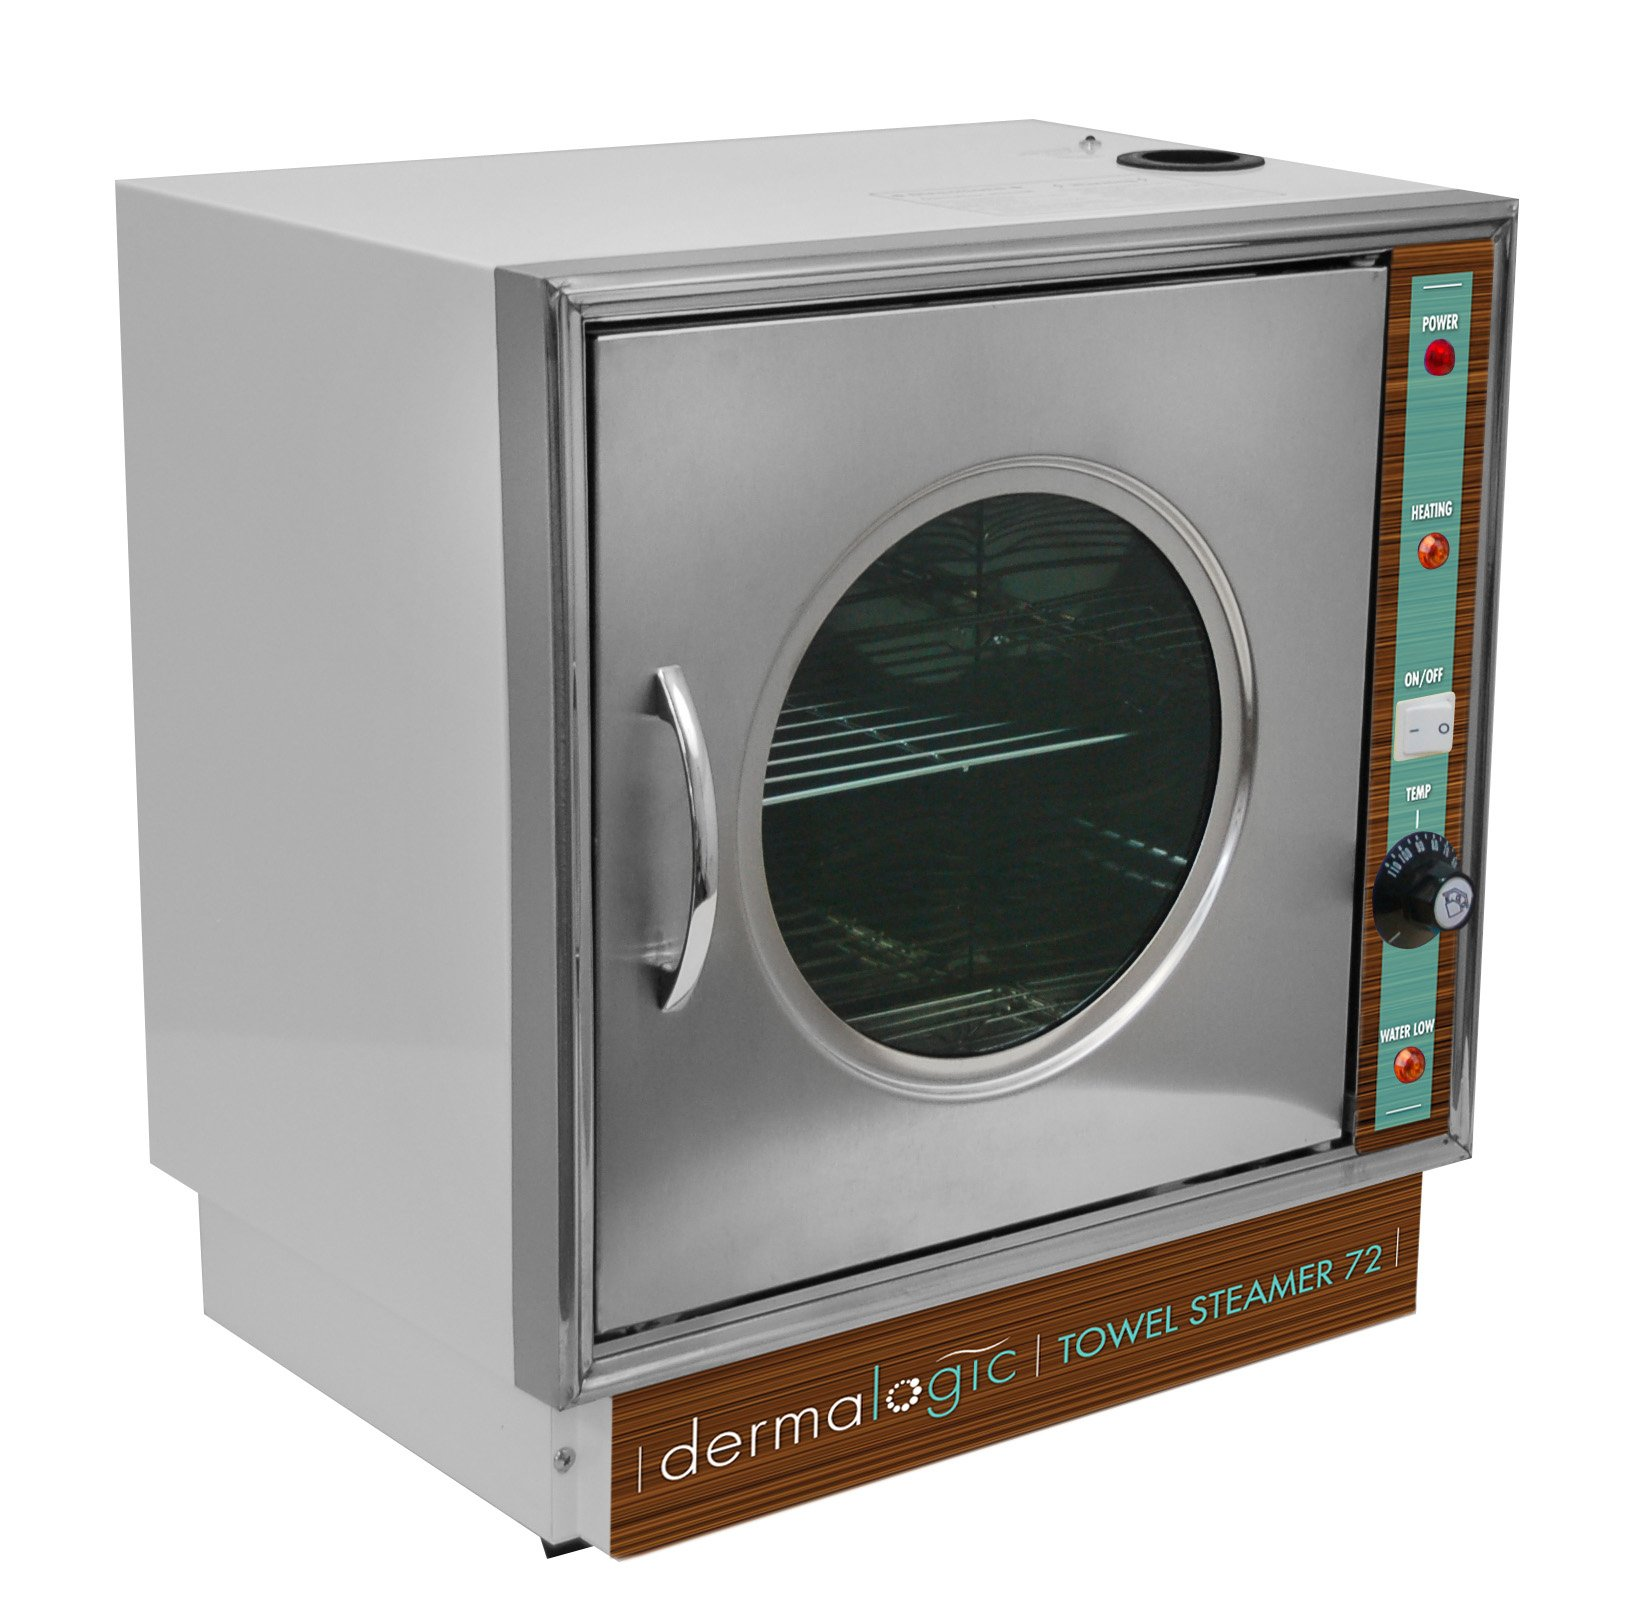 Towel Steamer 72 Massage Parlor, Barber Shop Beauty & Nail Salon Furniture and Equipment